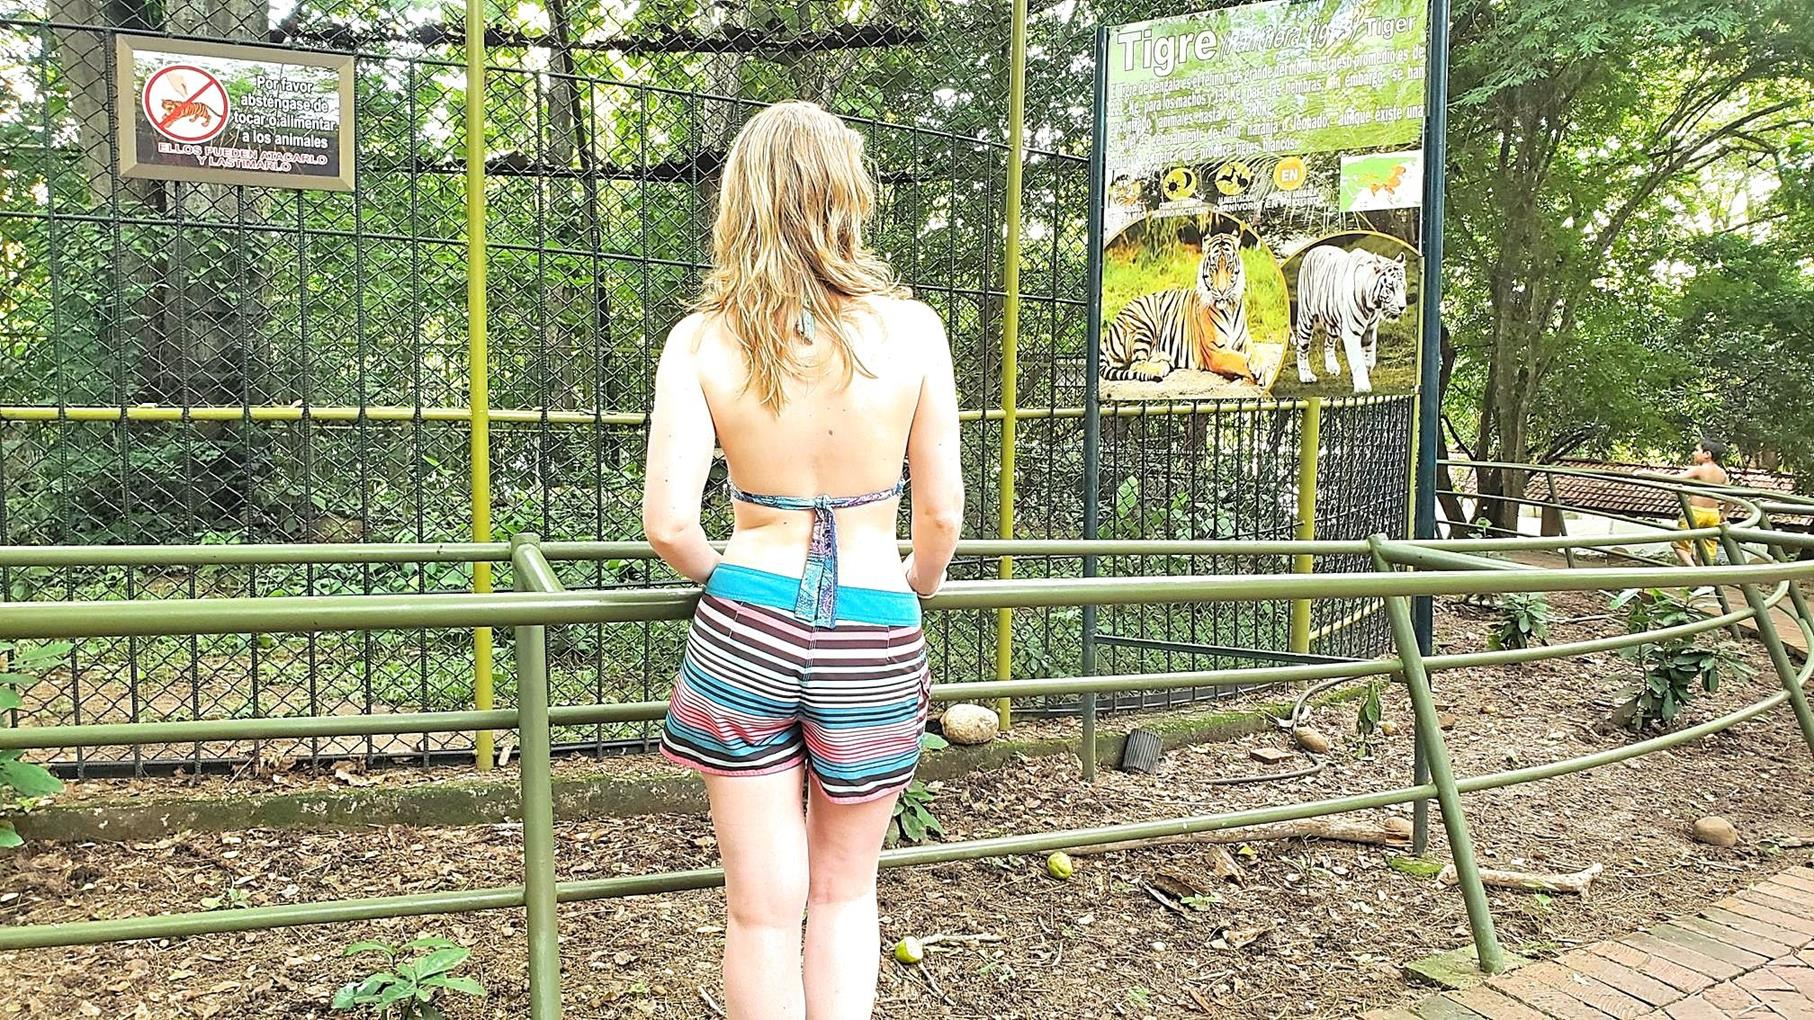 Piscilago Colombia dierentuin